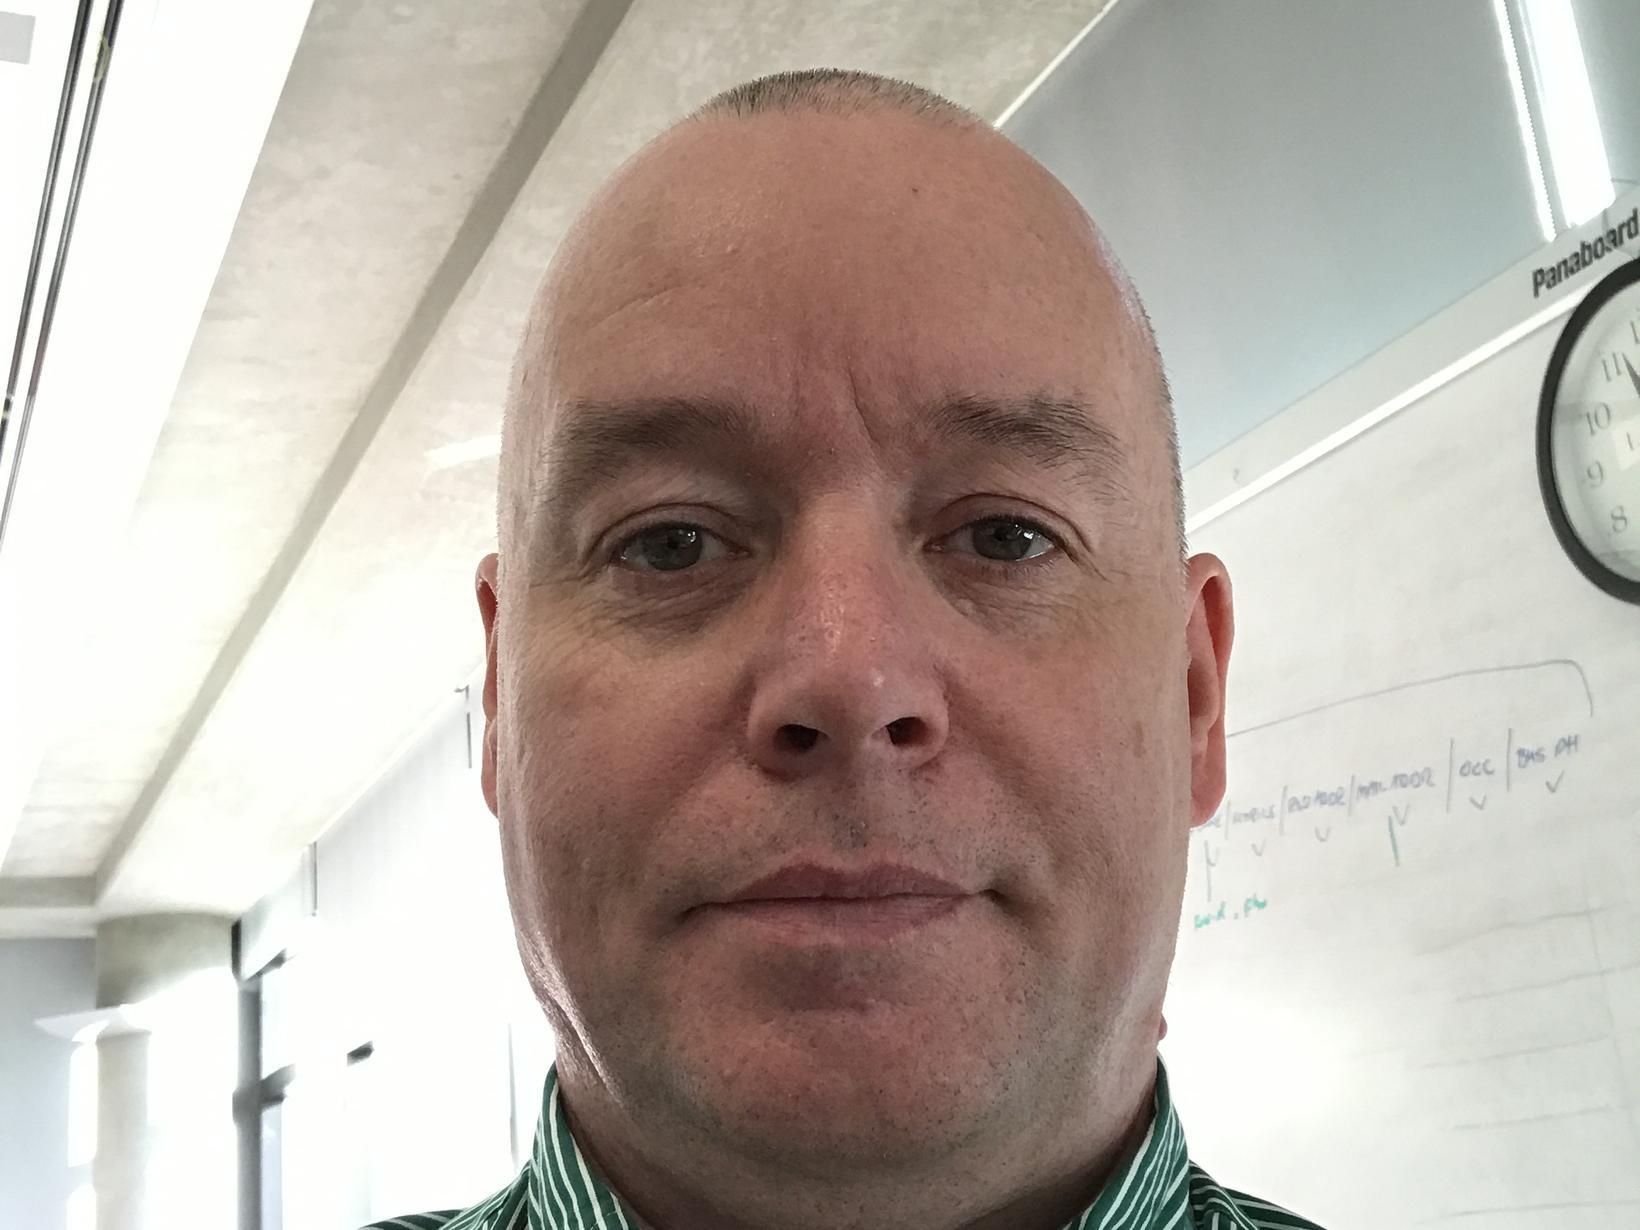 Paul from Riddell, Victoria, Australia